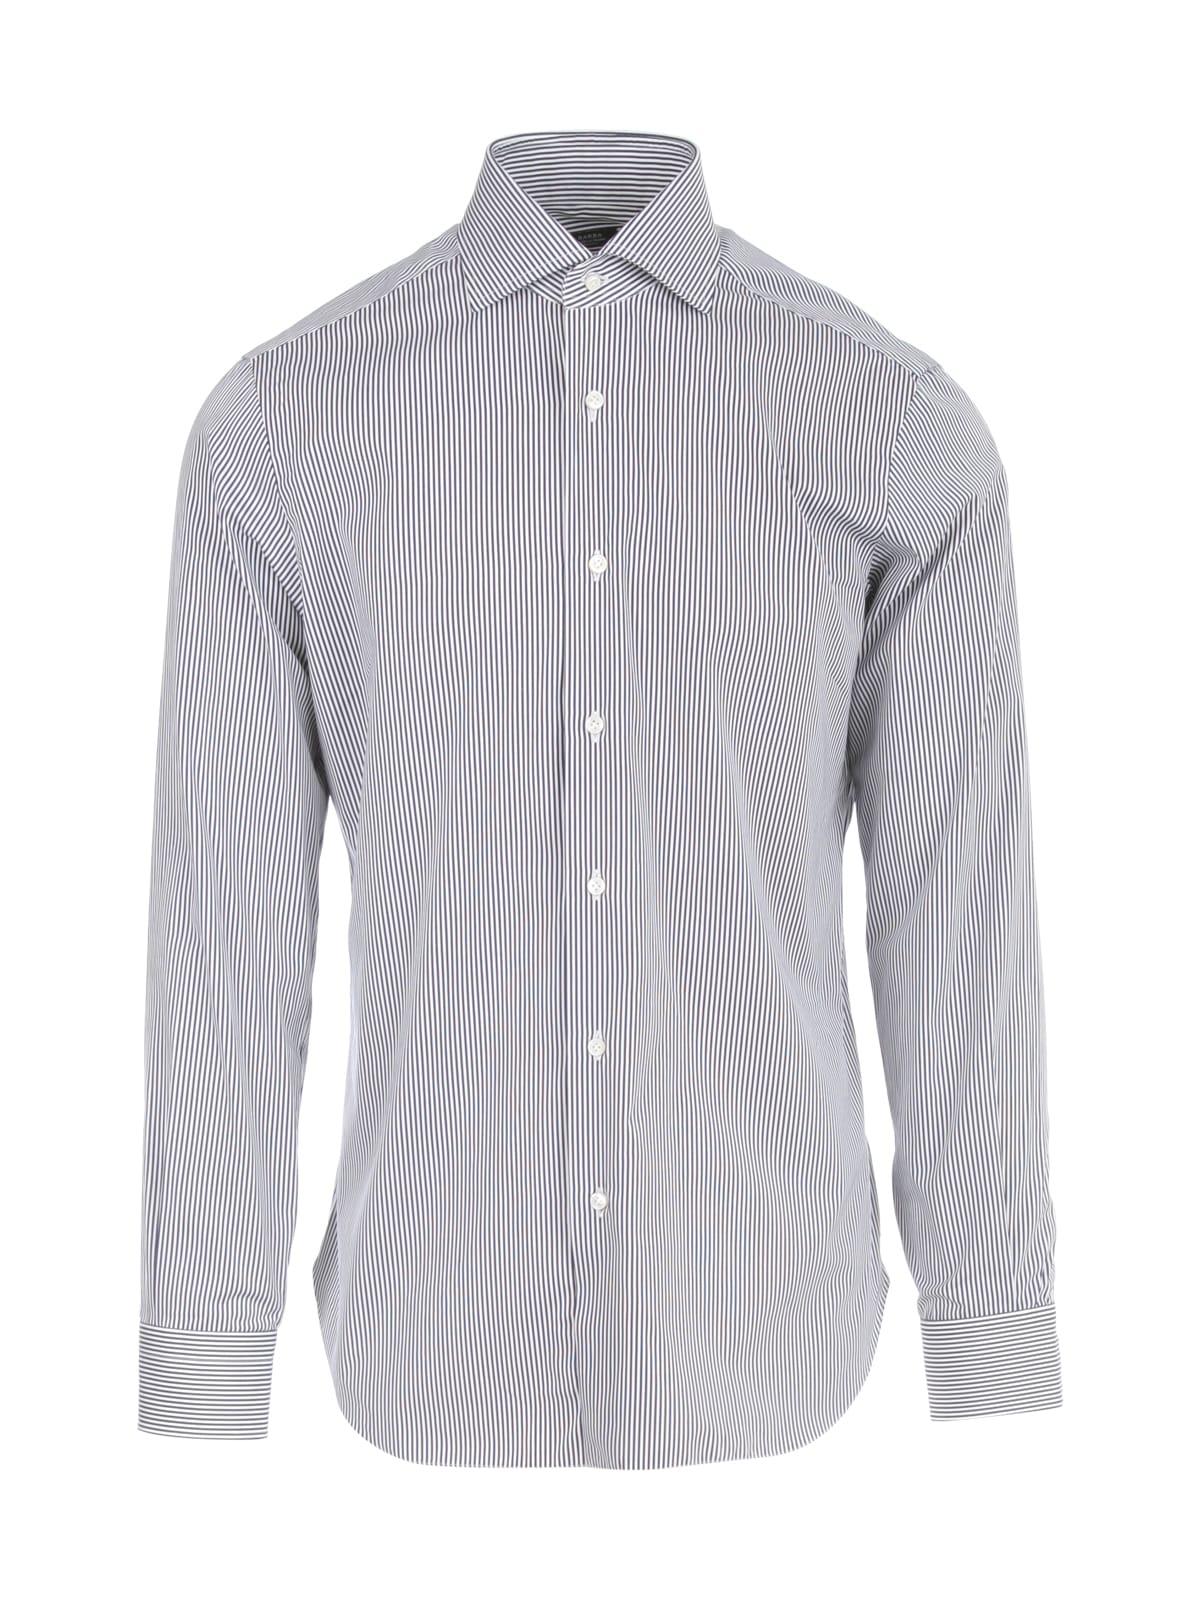 Small Neck Shirt